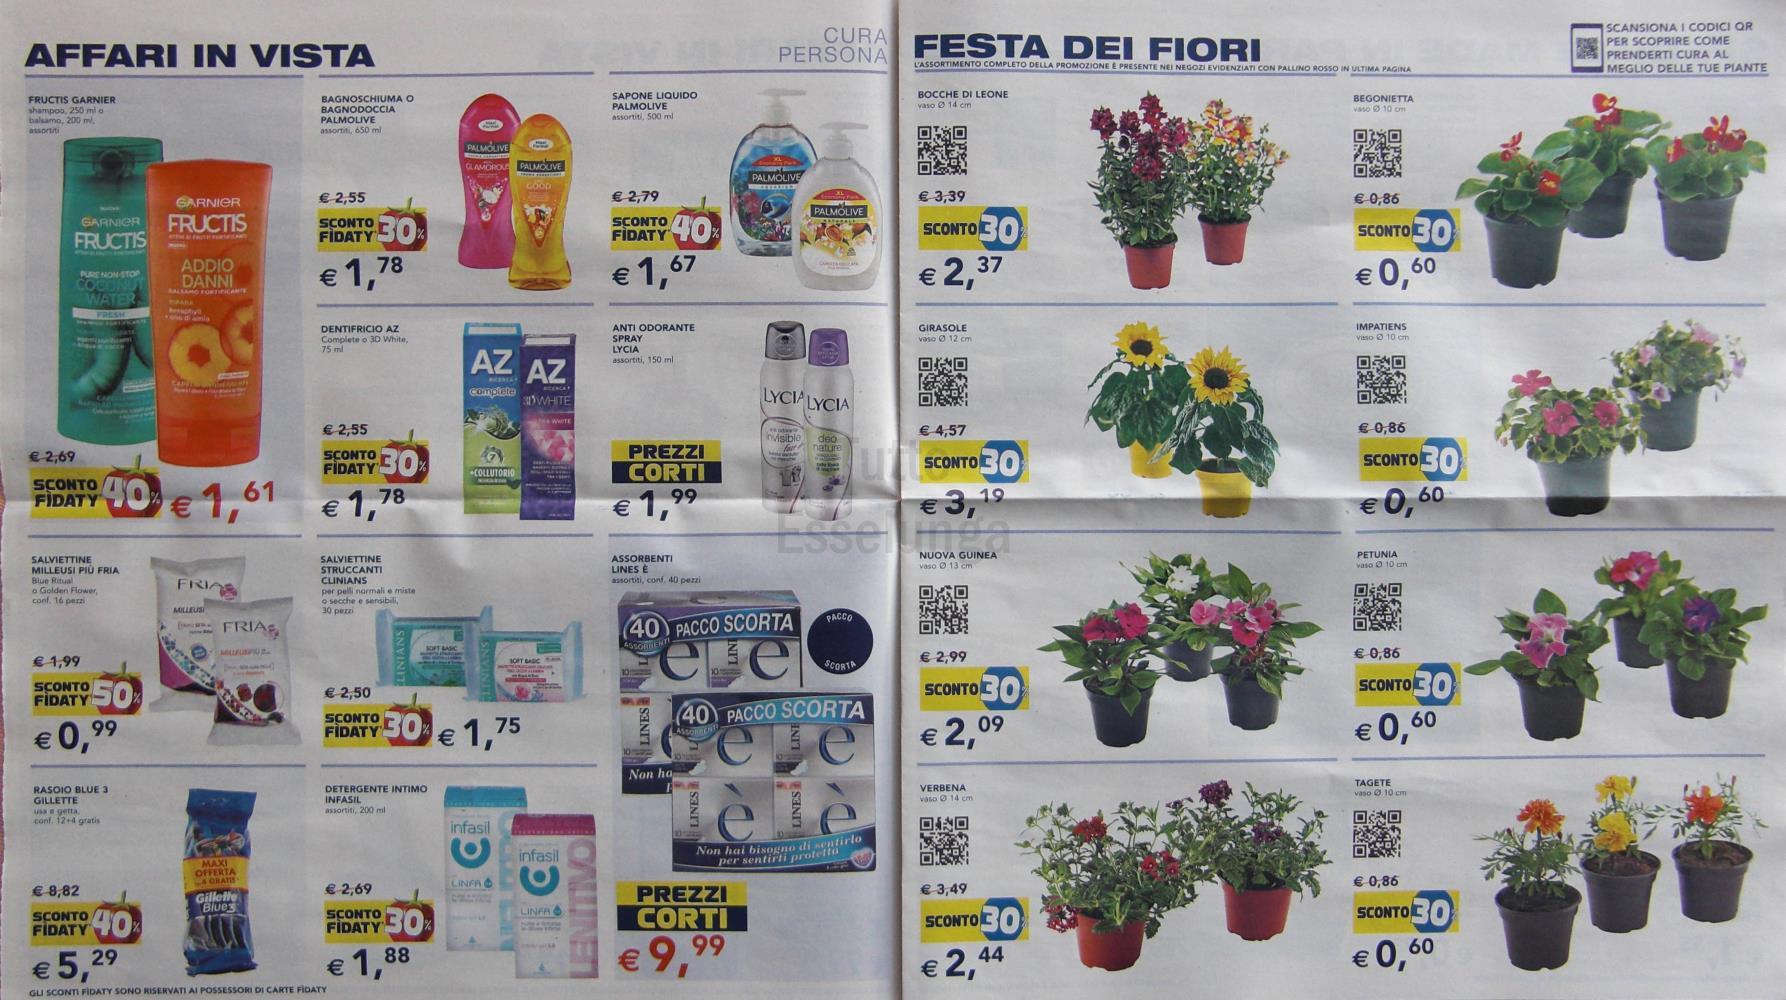 Volantino esselunga del 19 aprile 2017 tuttoesselunga for Esselunga catalogo 2017